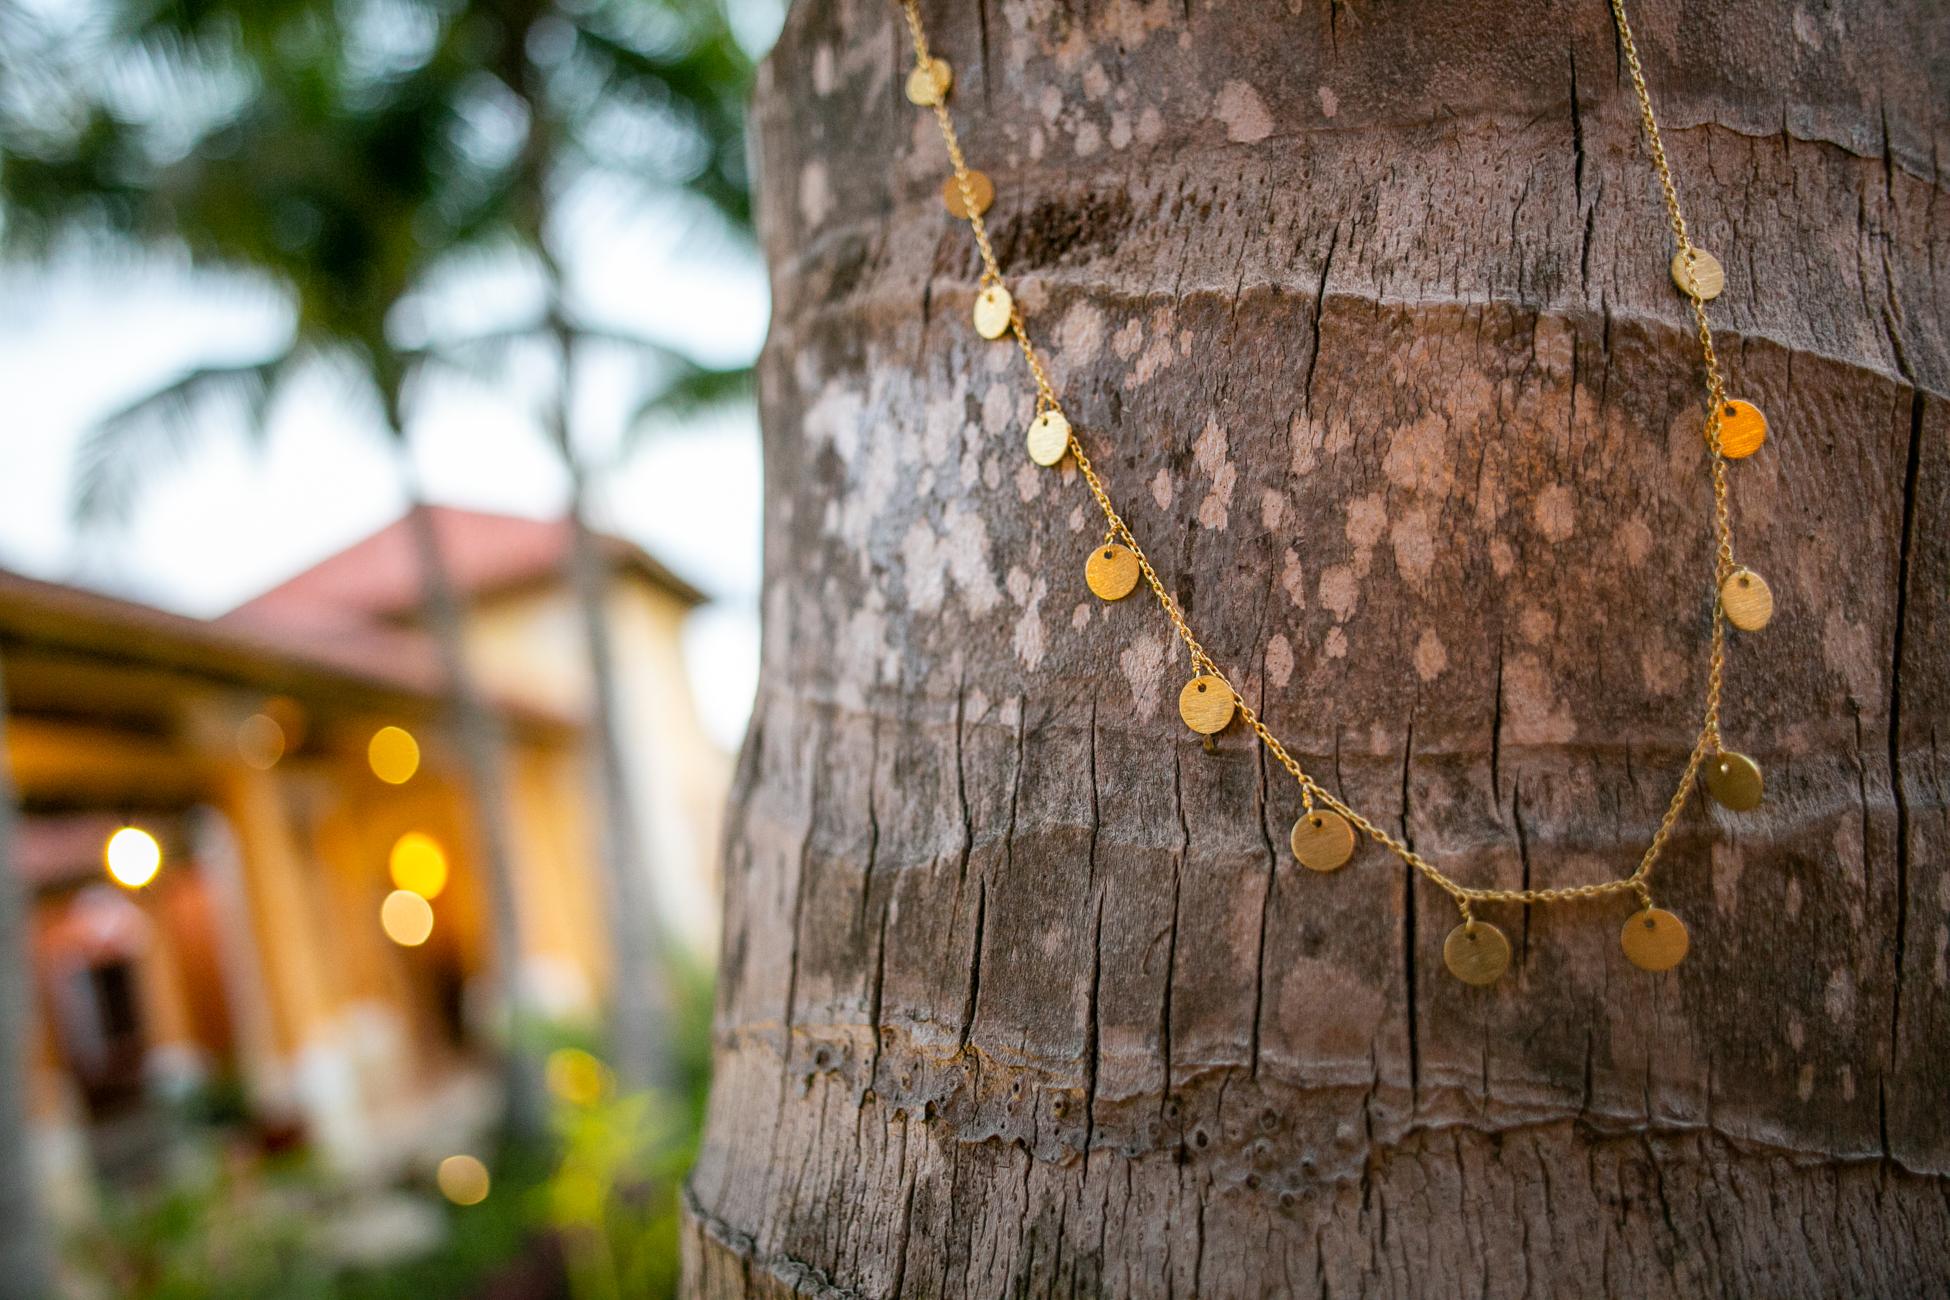 Susan Rifkin  necklace on palm tree